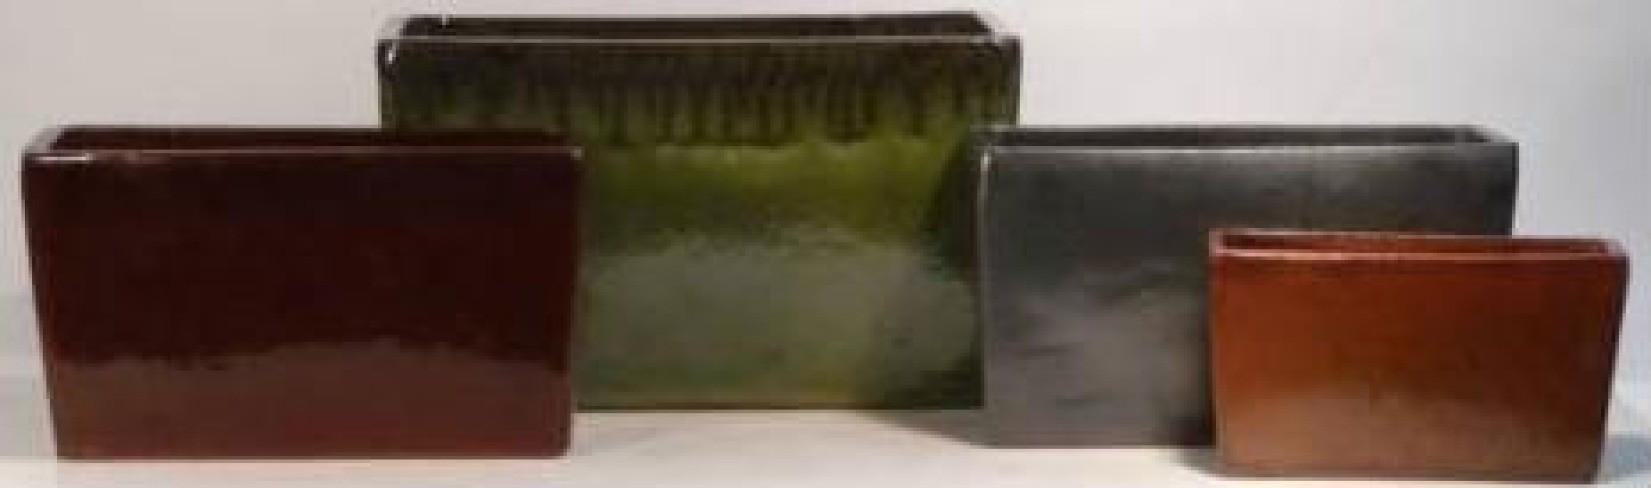 Green Rectangle Shape Ceramic Planter